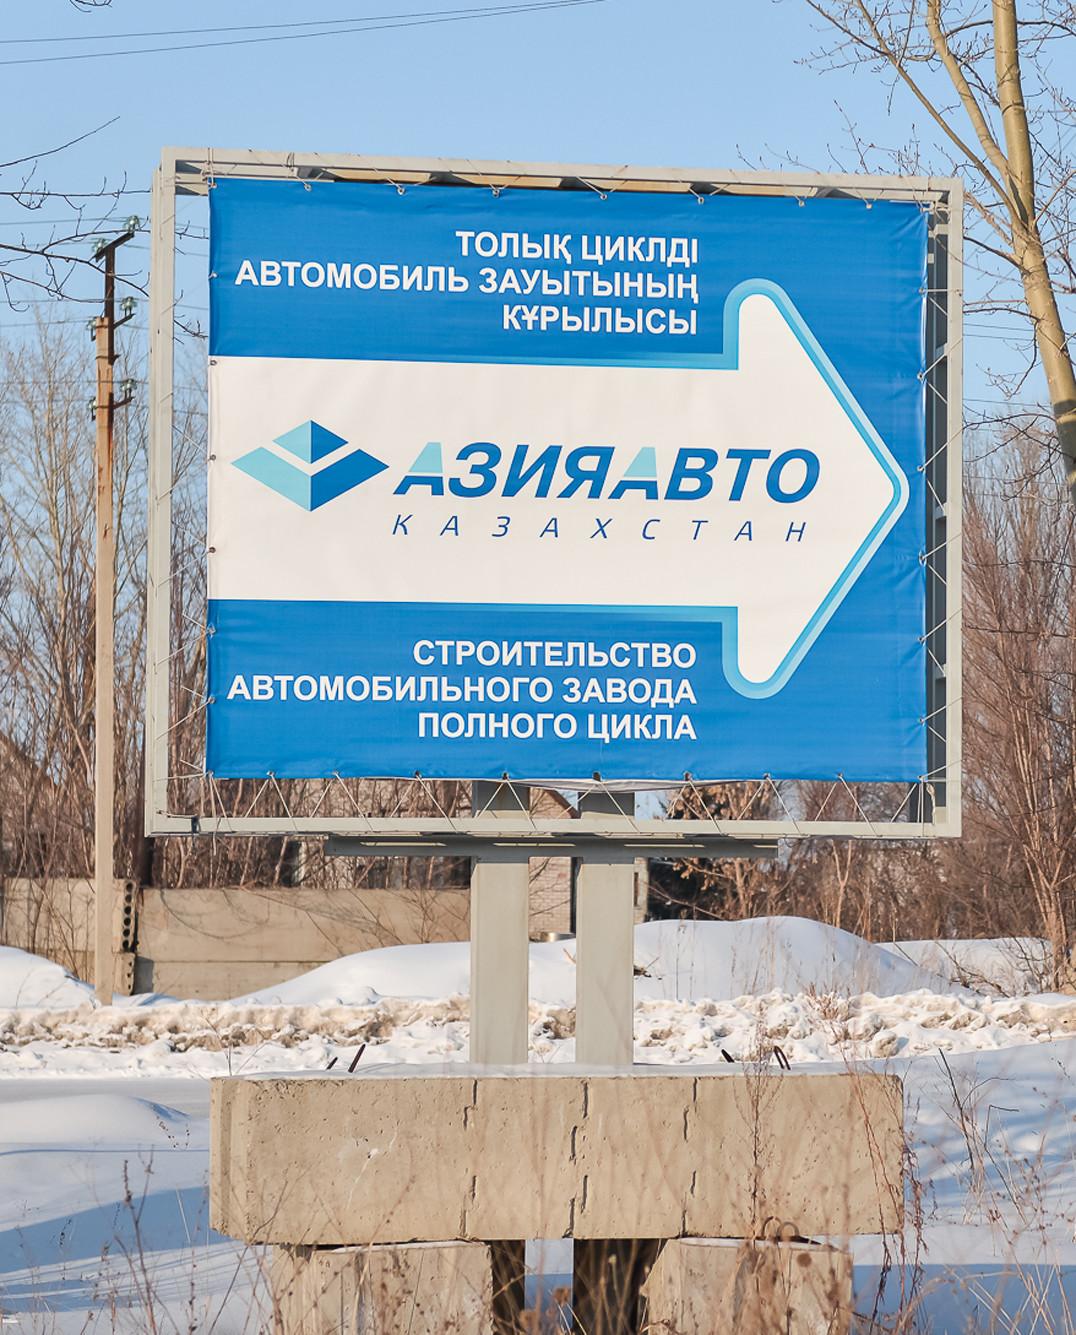 Президент АВТОВАЗа: Казахстан— номер один наэкспортном рынке Лада